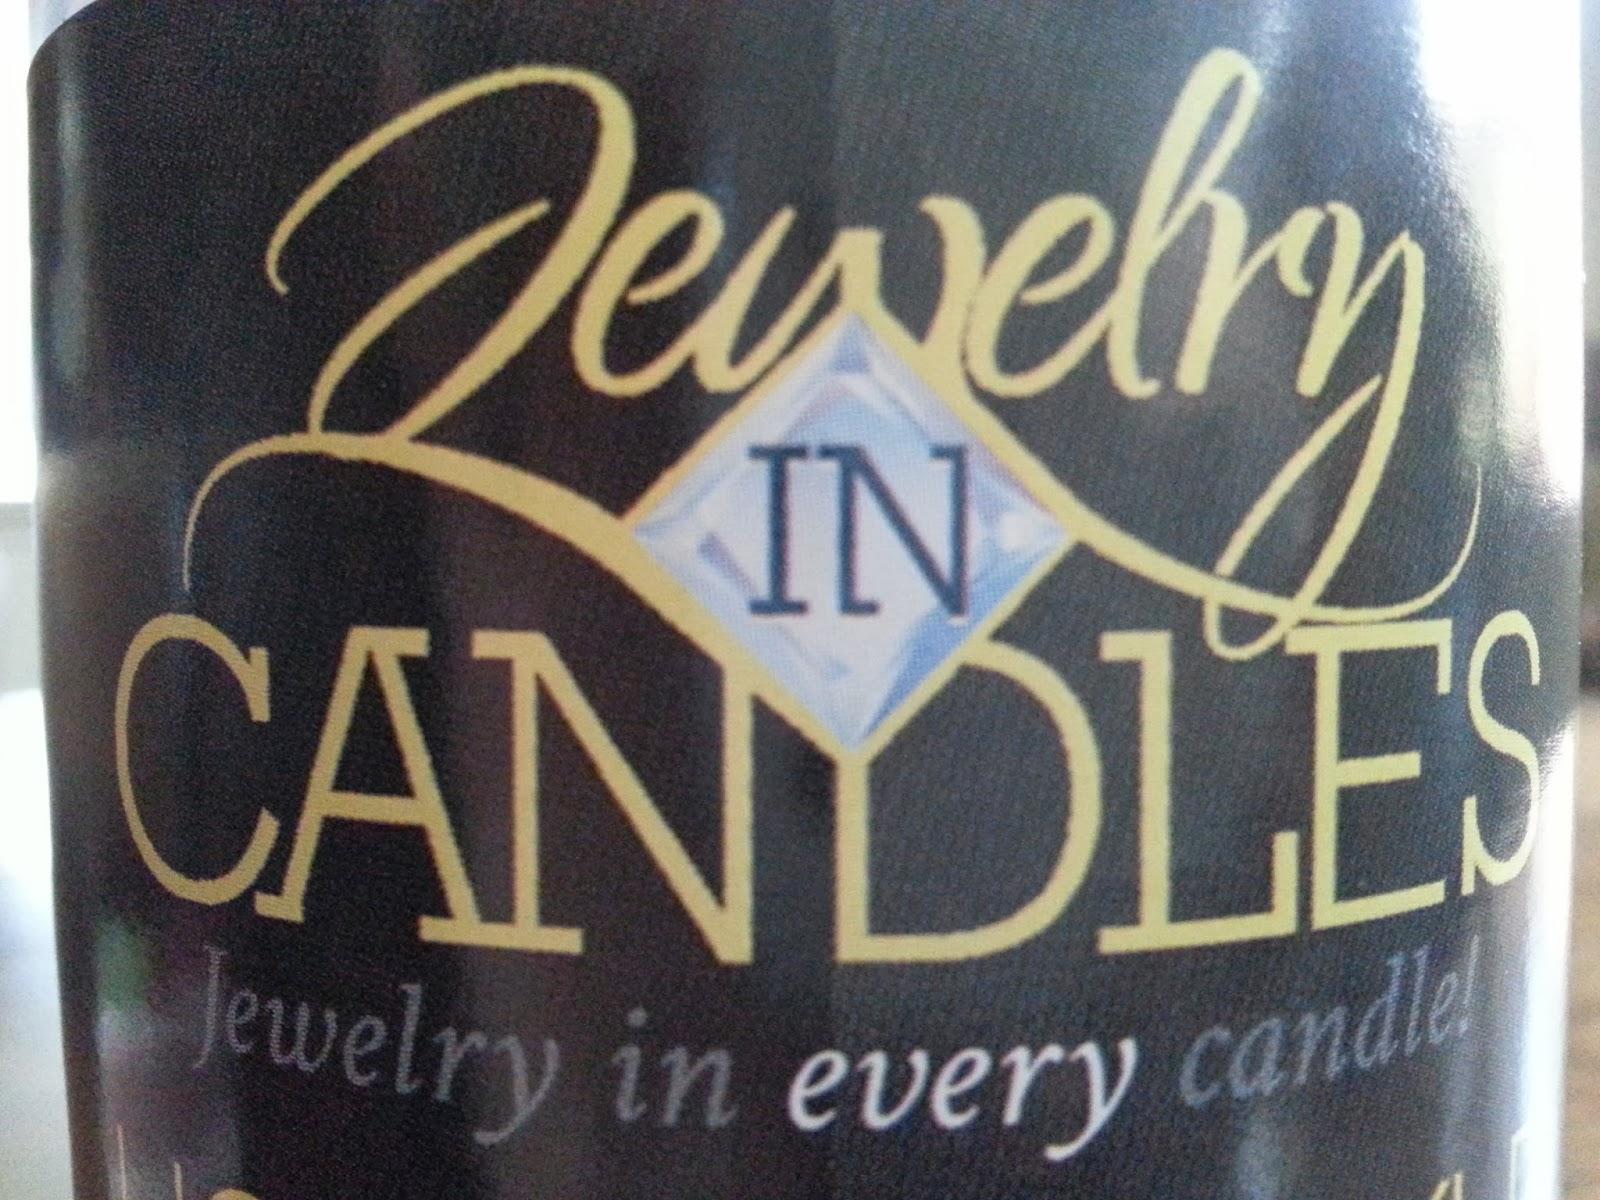 Jewelry in Candles Jewelry in Candles is a Candle